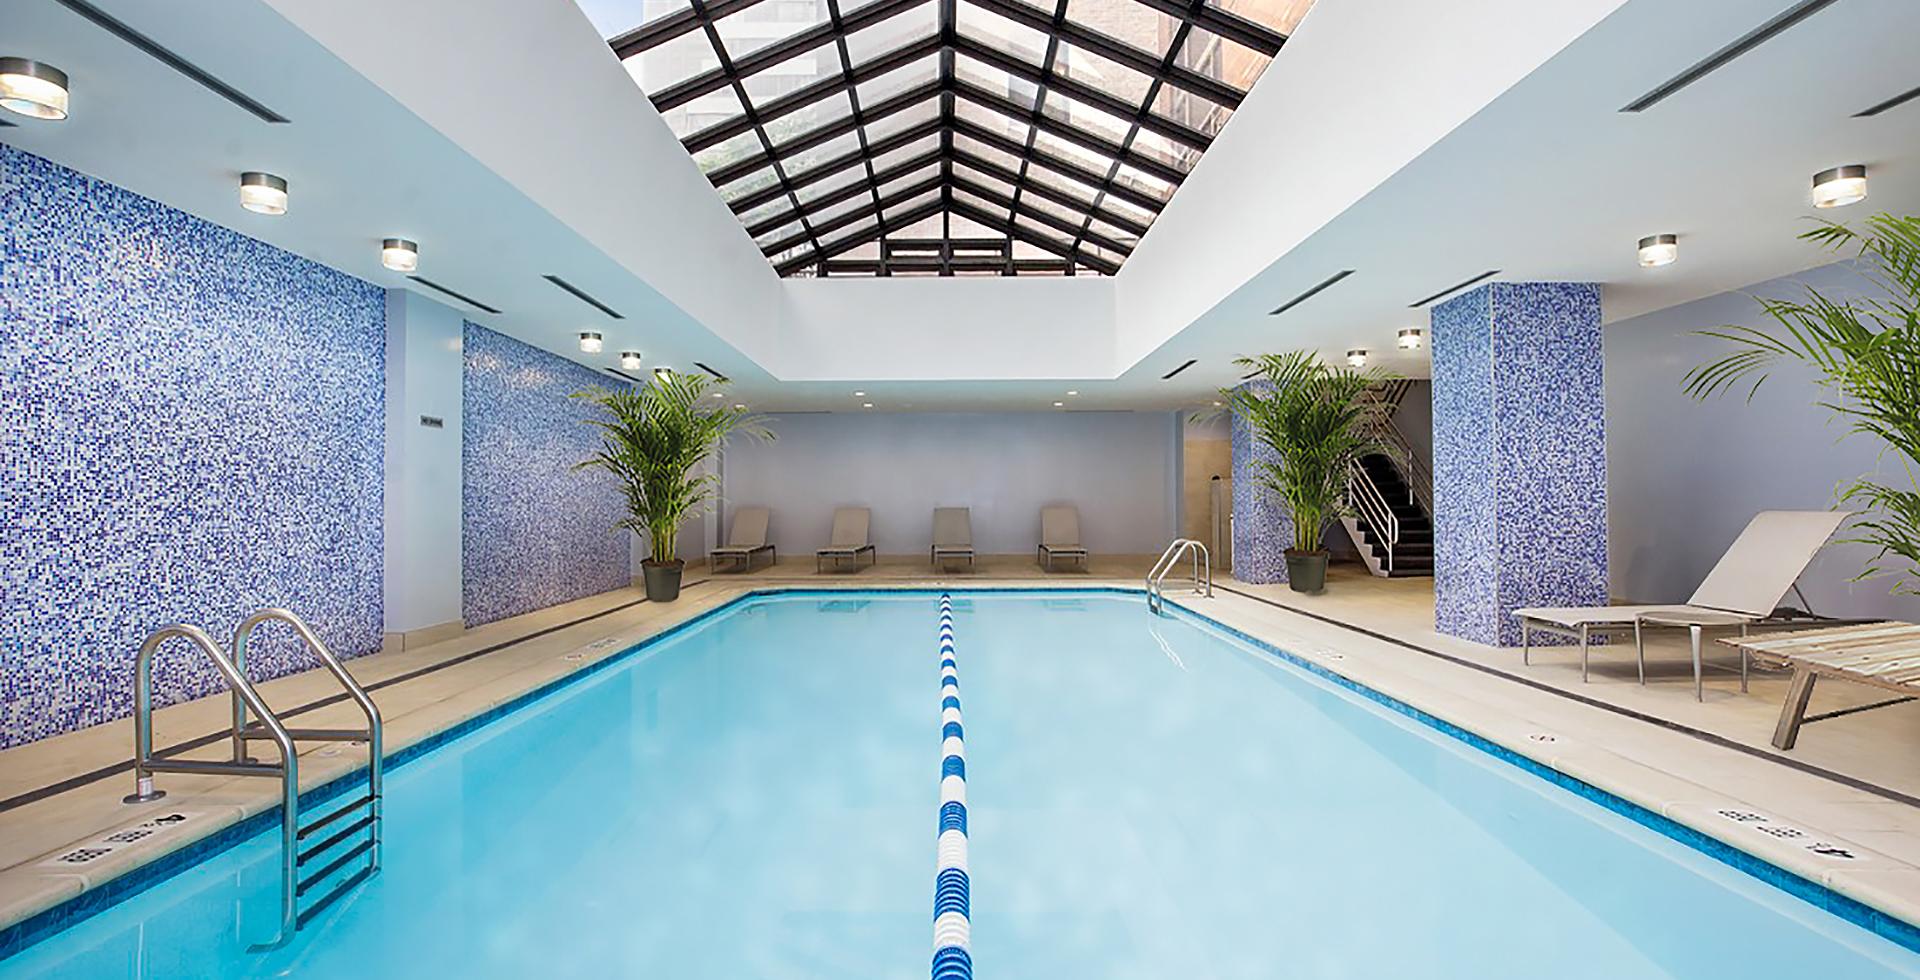 Pool  1920x980